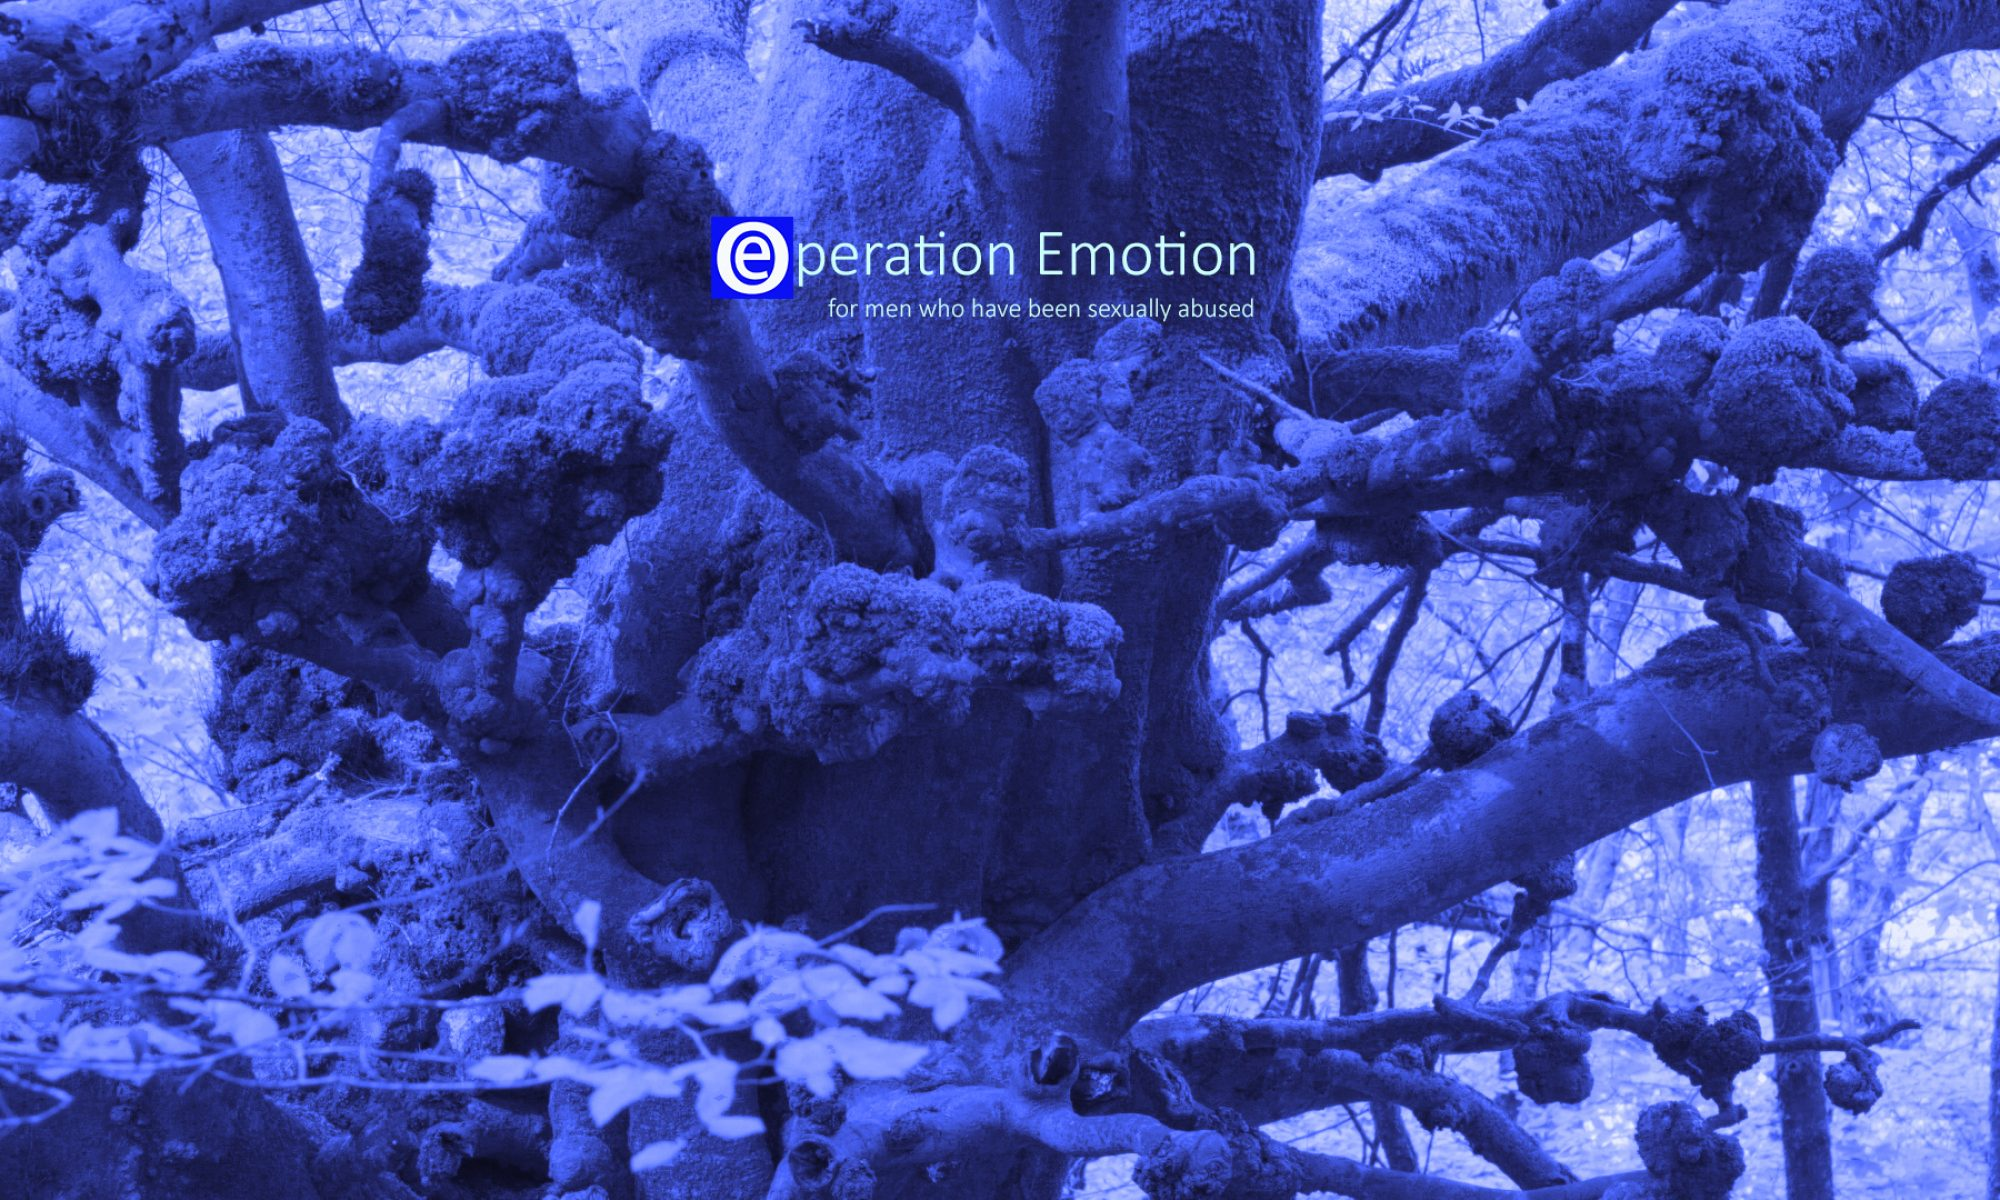 Operation Emotion